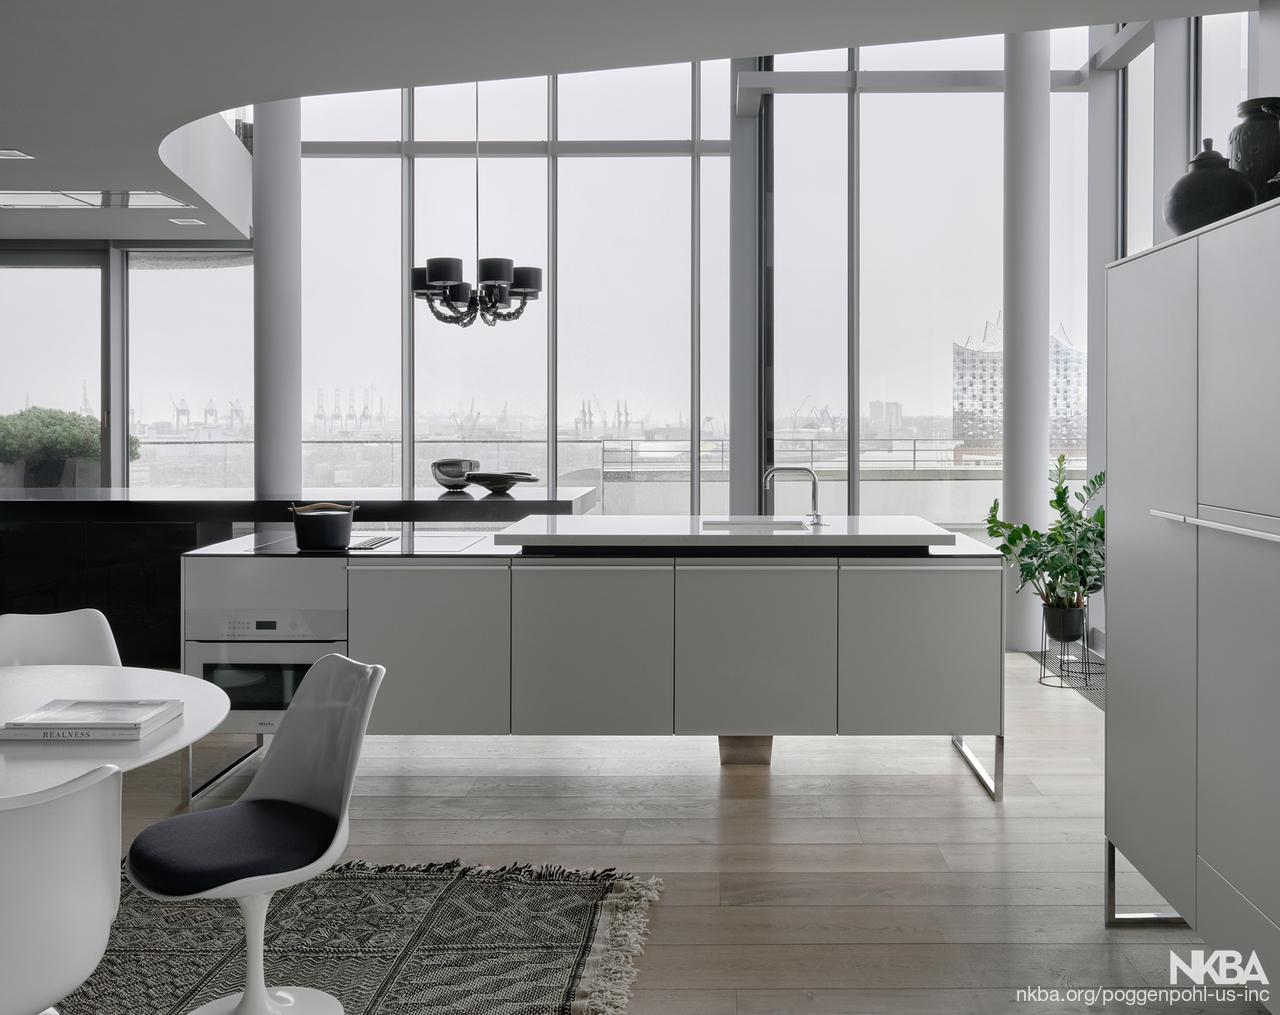 poggenpohl preise schn pino kchen fronten with poggenpohl preise kuche poggenpohl preise. Black Bedroom Furniture Sets. Home Design Ideas